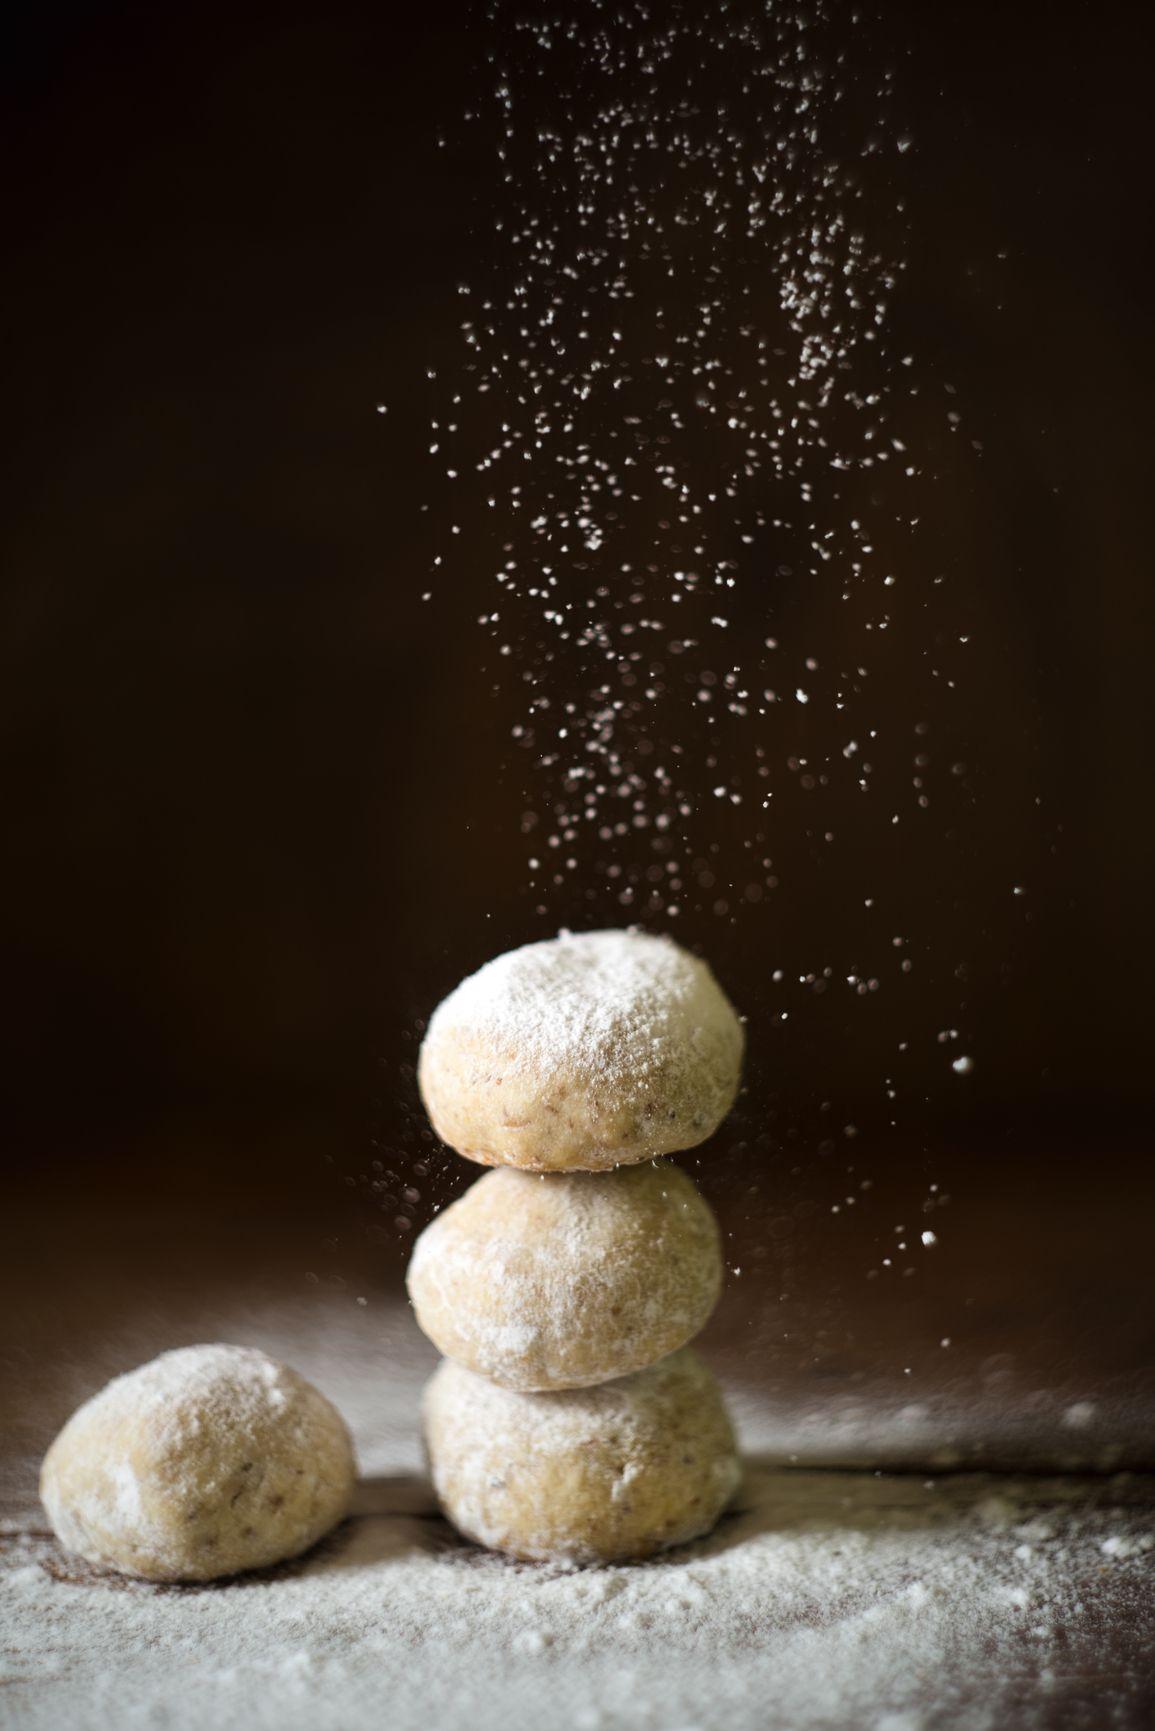 Russian Spice Cookies (Pryaniki) Recipe